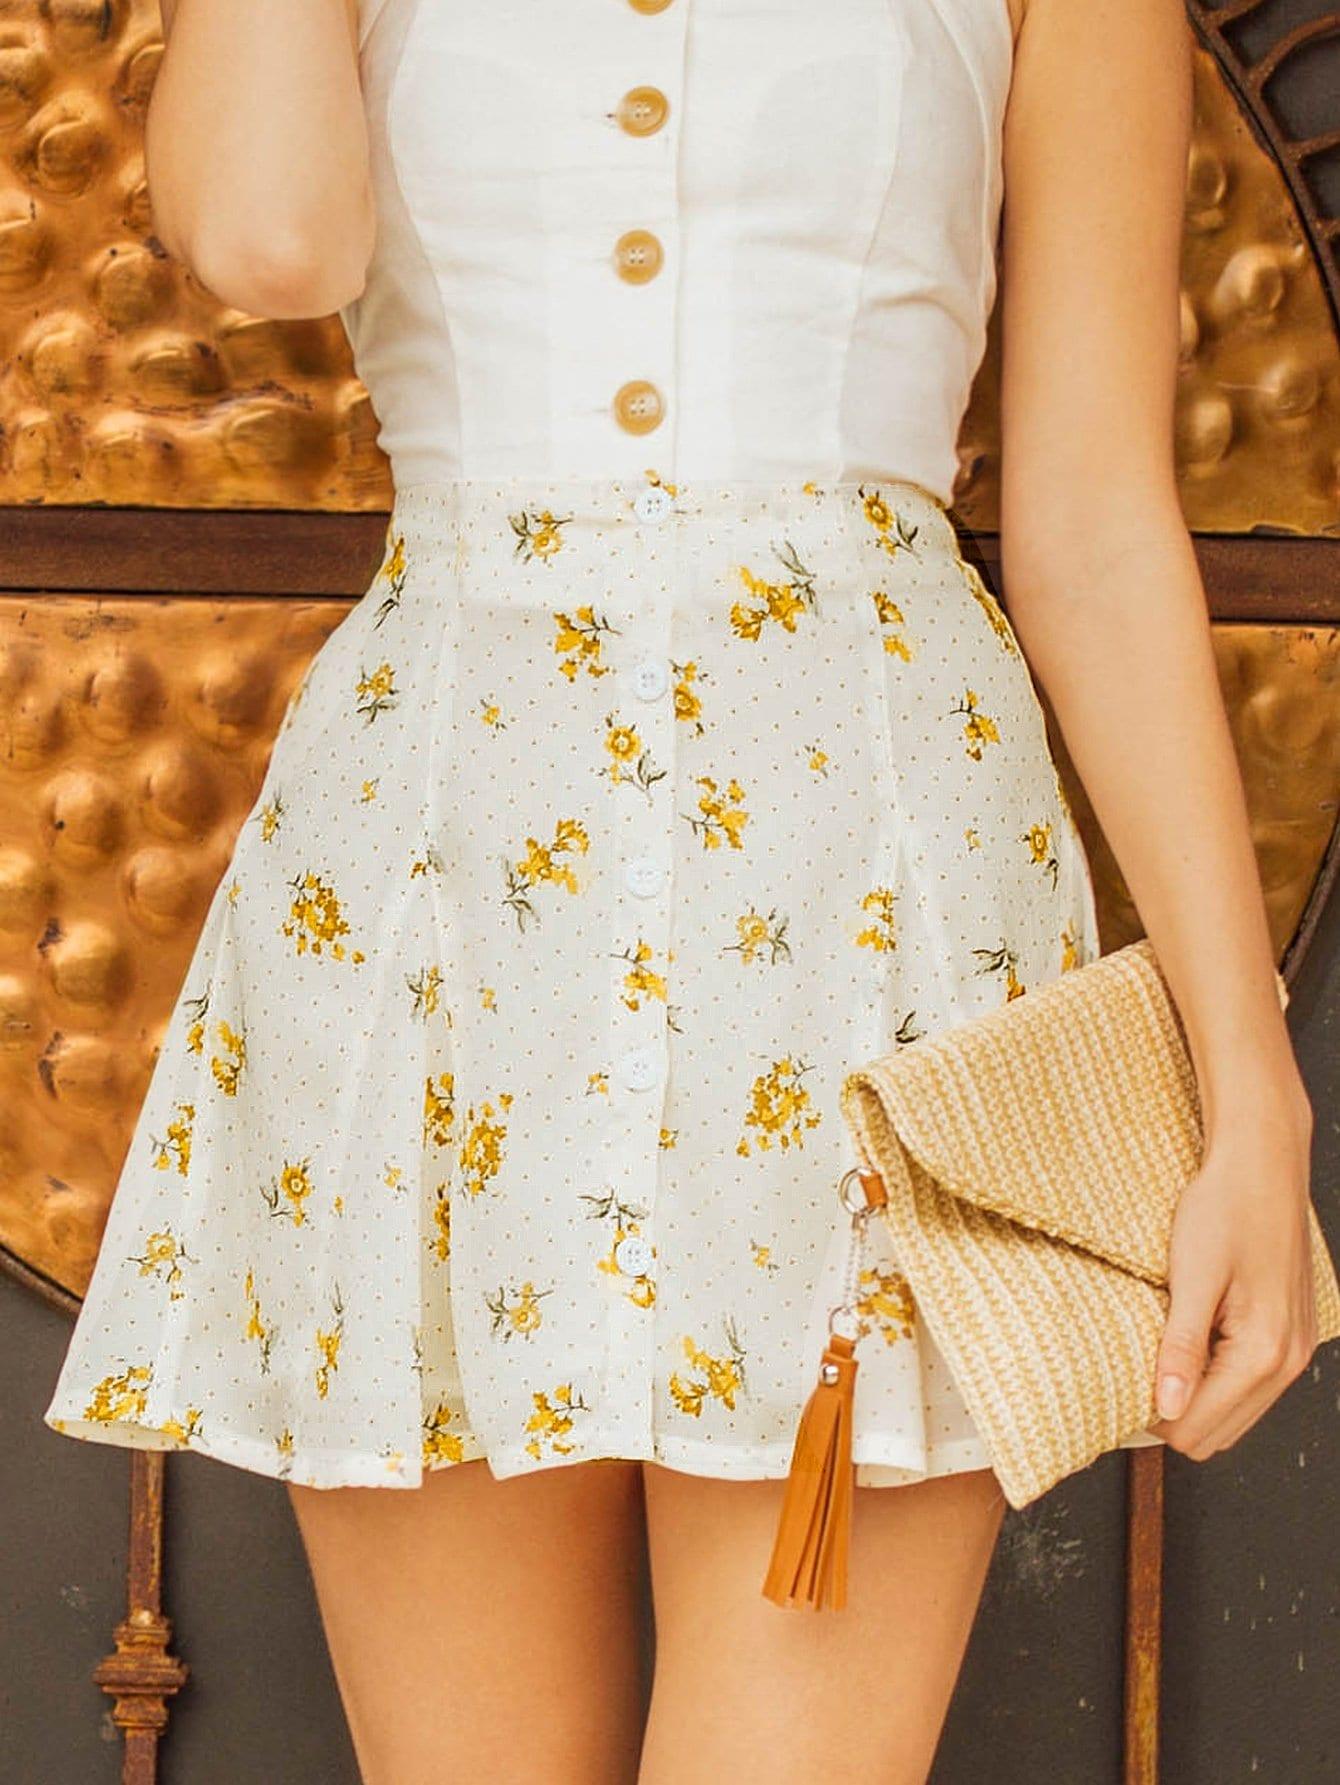 Daisy Print Button Detail Flare Skirt gold button detail bodycon skirt